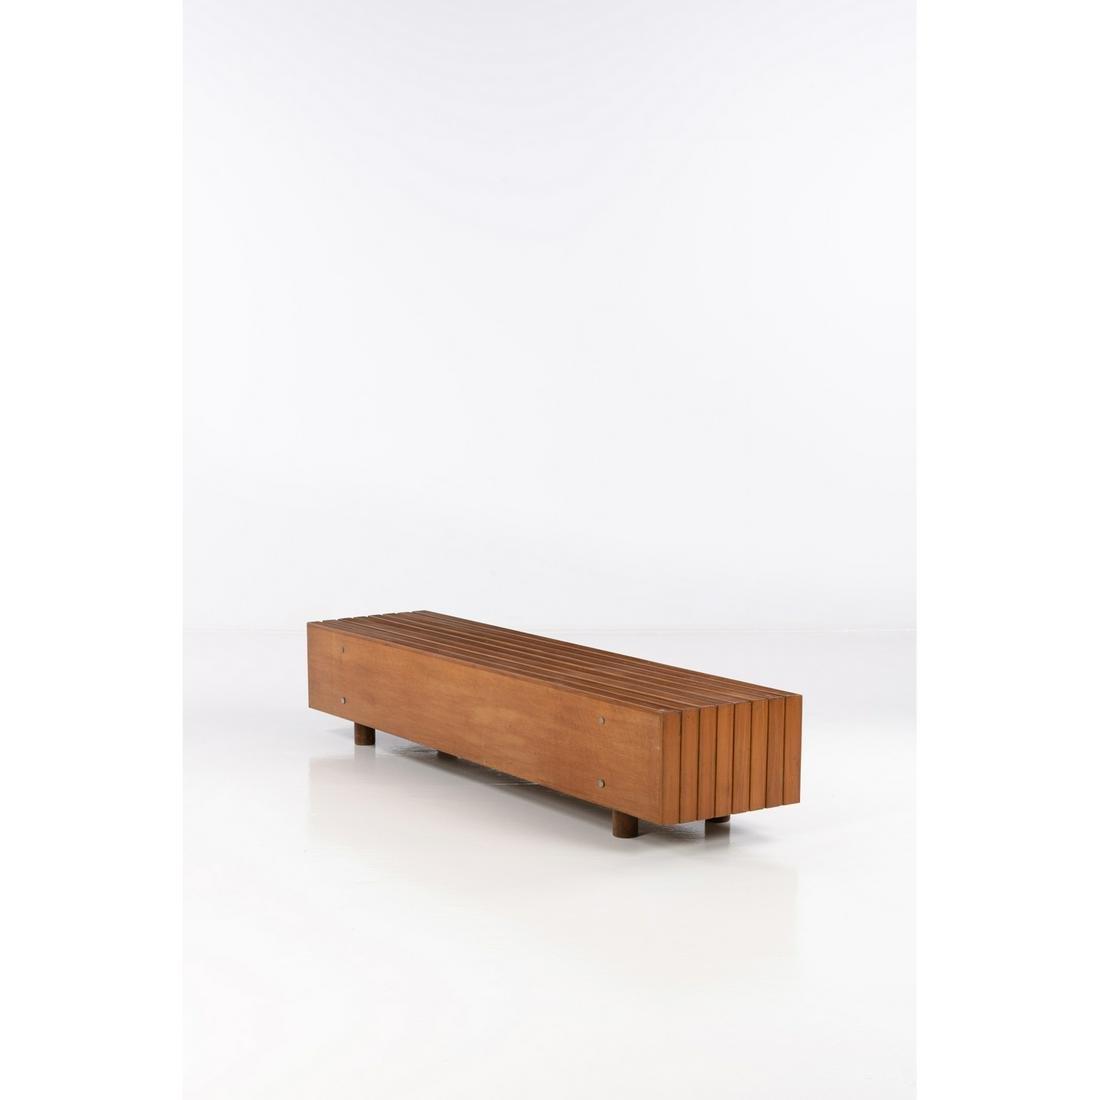 ƒ Sergio Rodrigues (1927-2014) Bench Veneer and